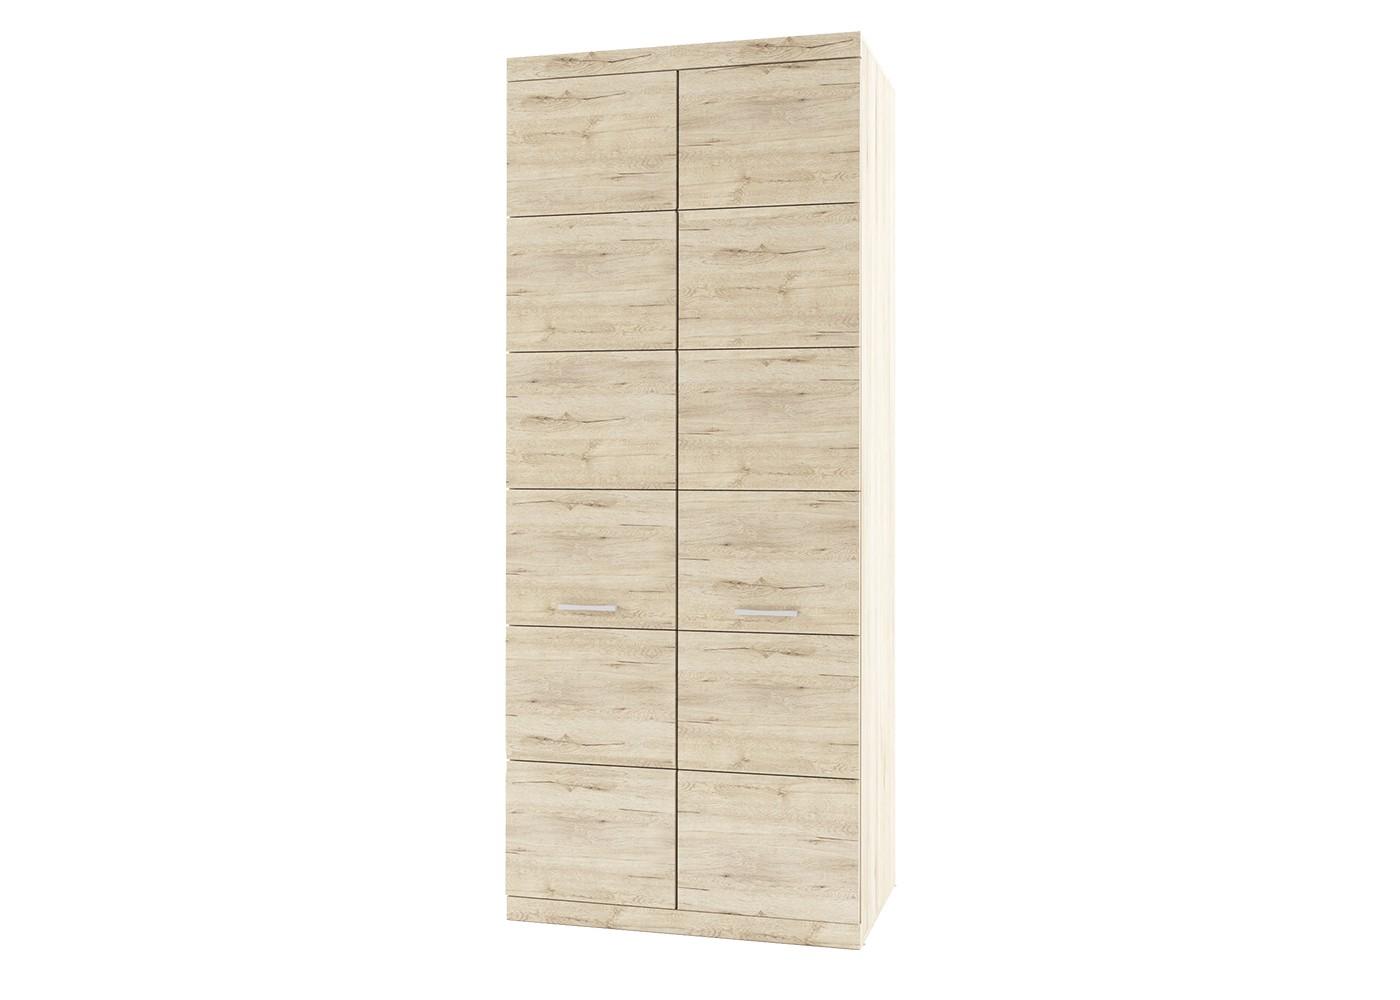 Шкаф OscarБельевые шкафы<br><br><br>Material: ДСП<br>Ширина см: 90<br>Высота см: 217<br>Глубина см: 57